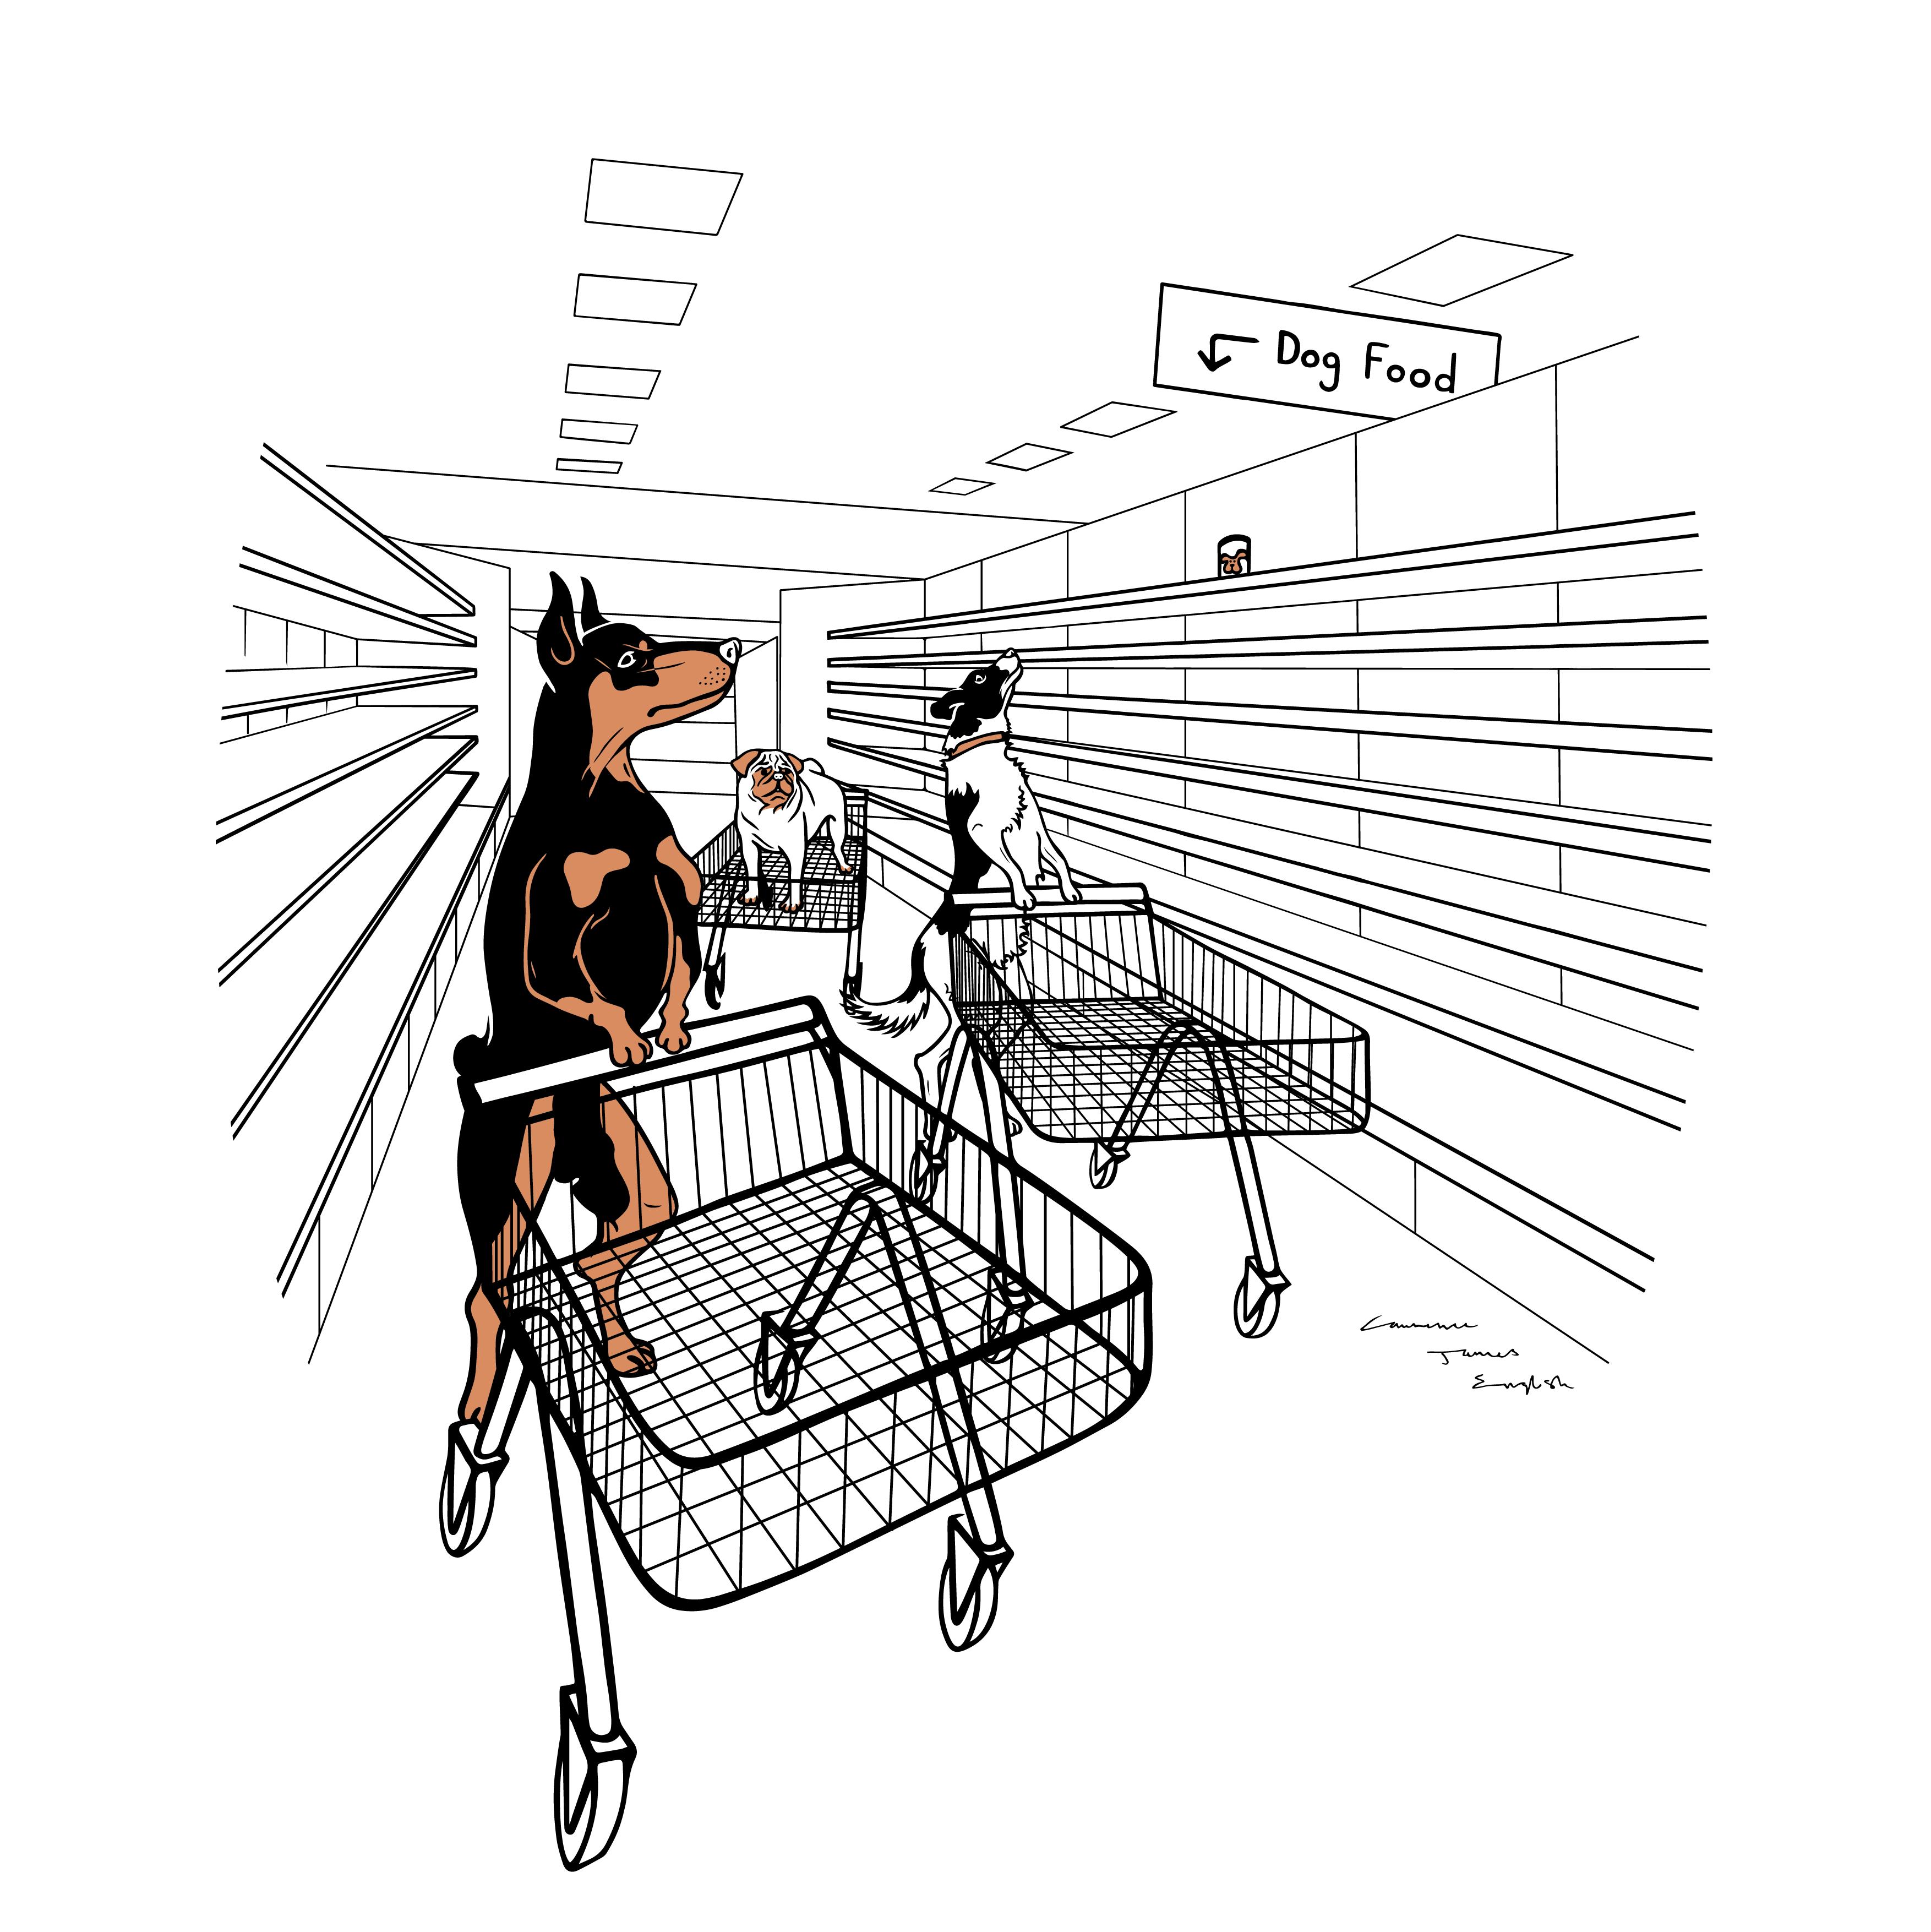 Dogsupermarketteew